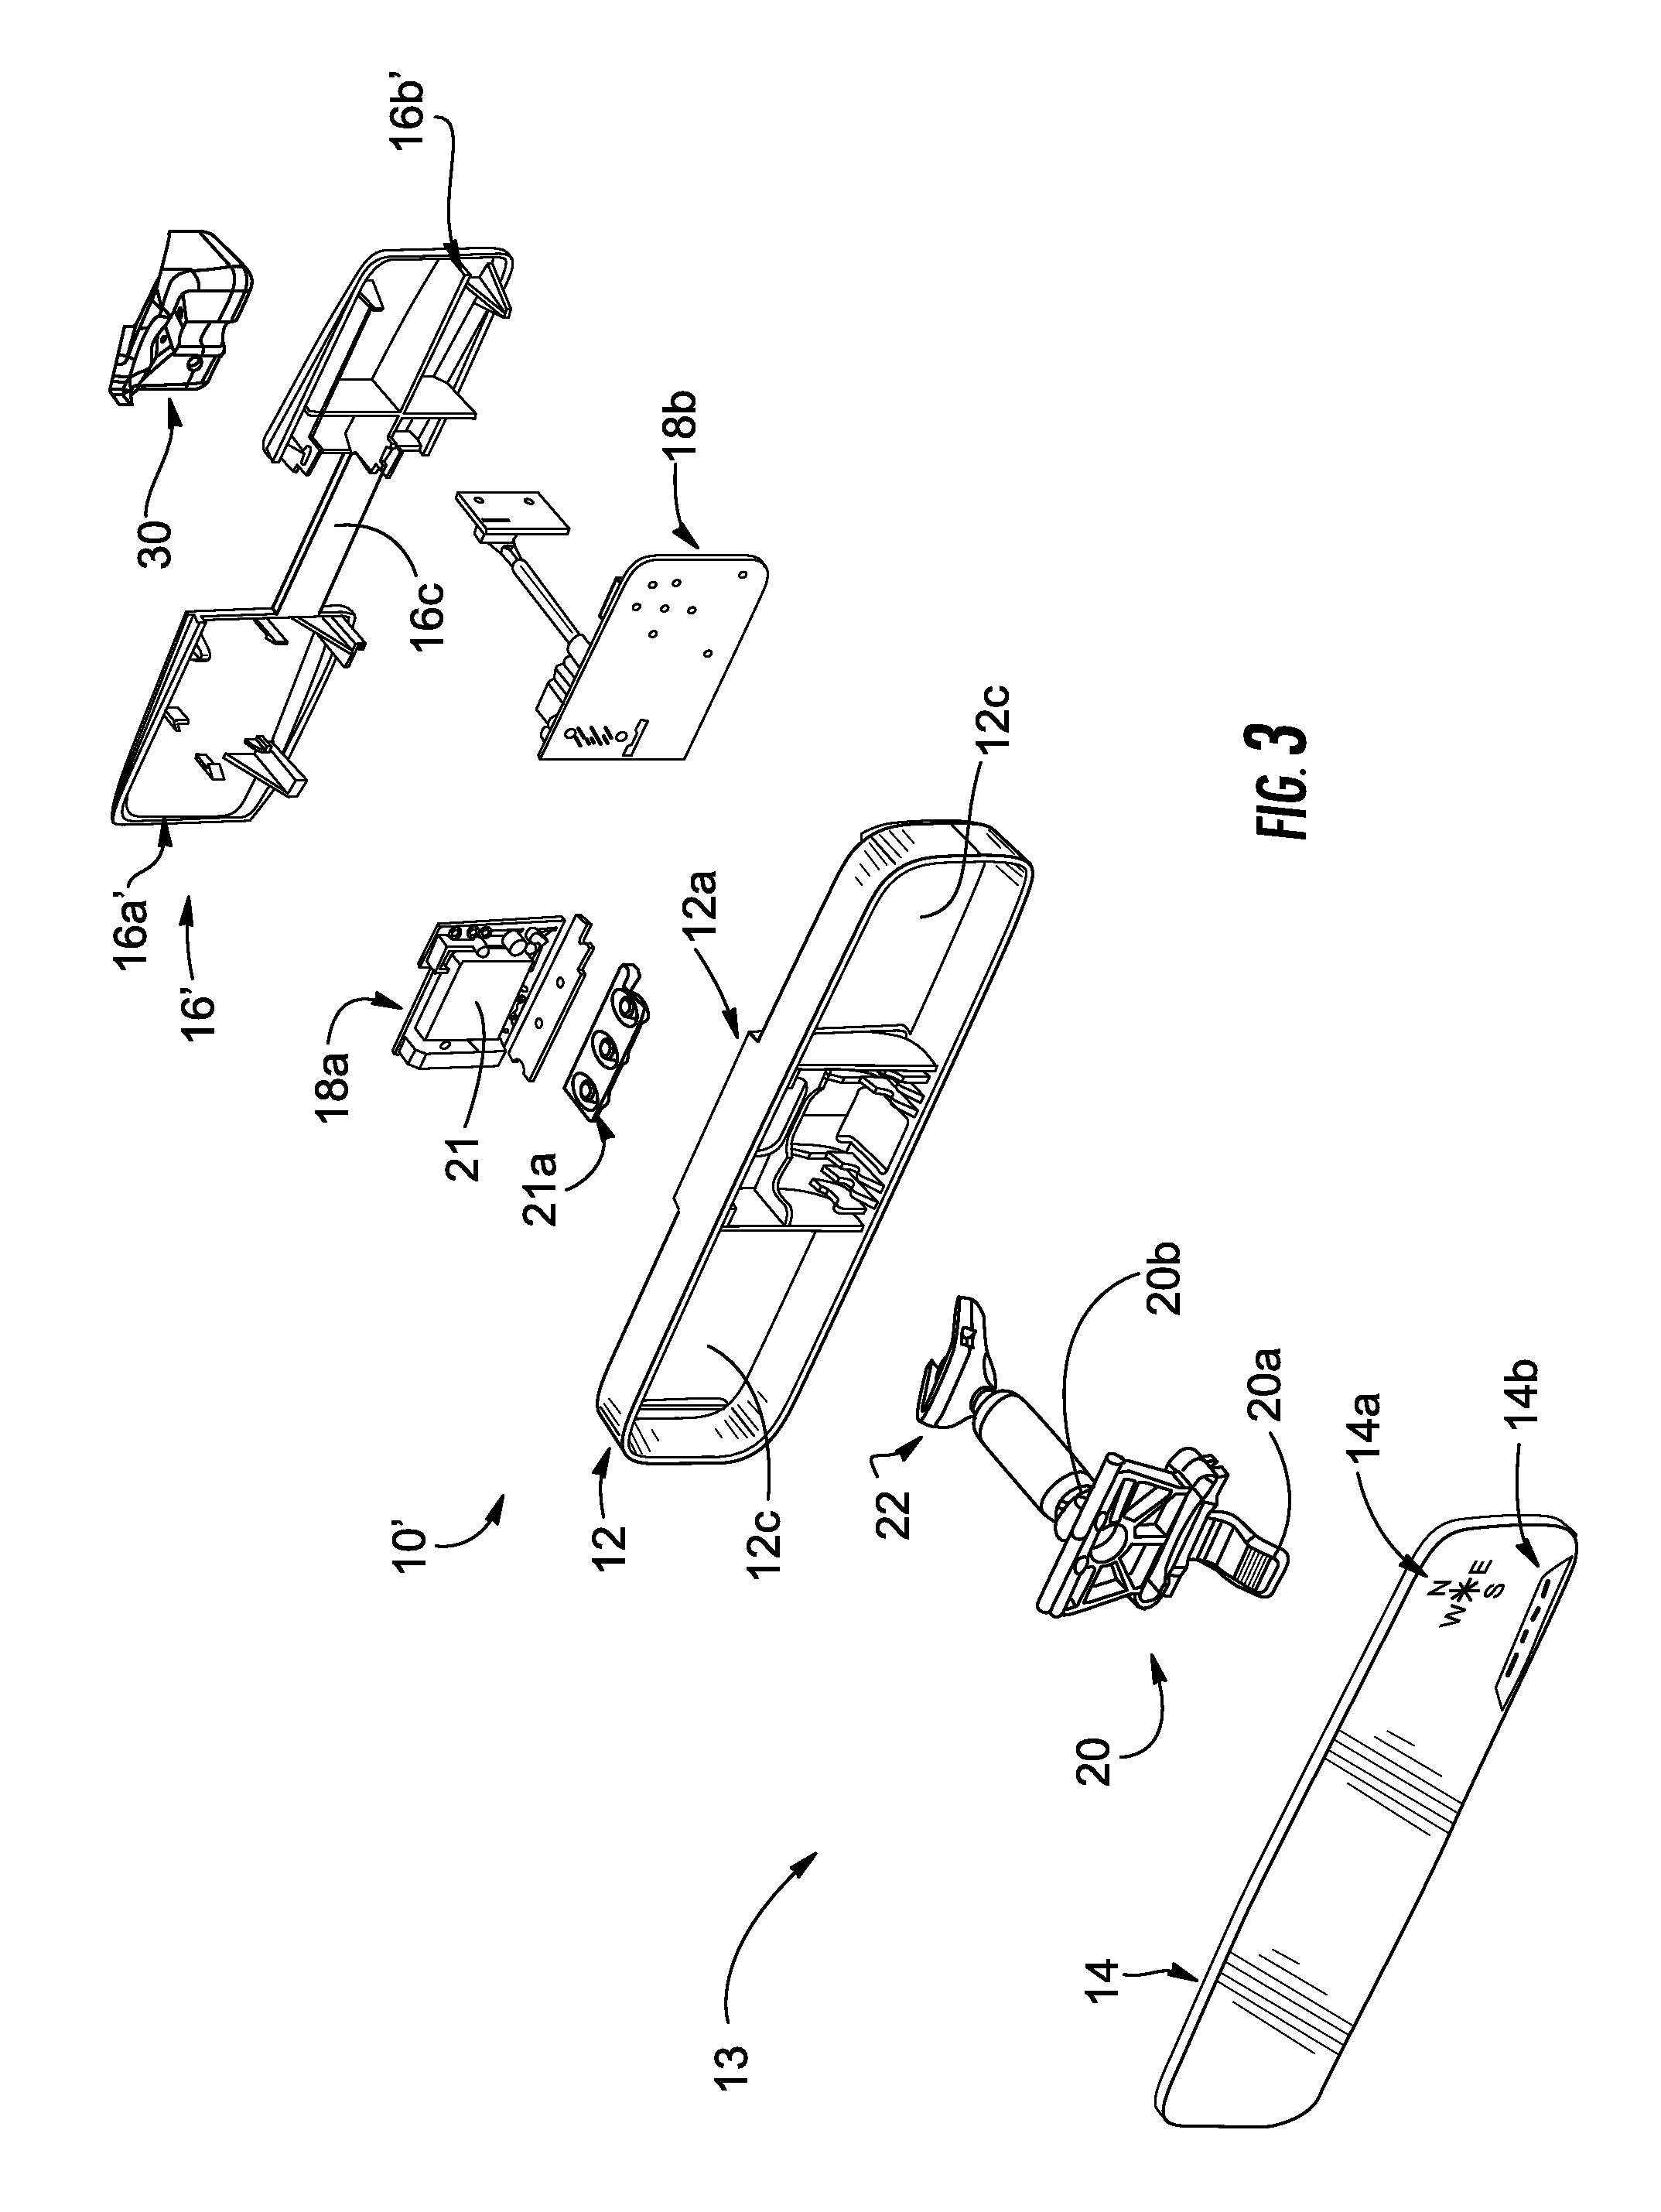 patent us 8 325 055 b2  patent